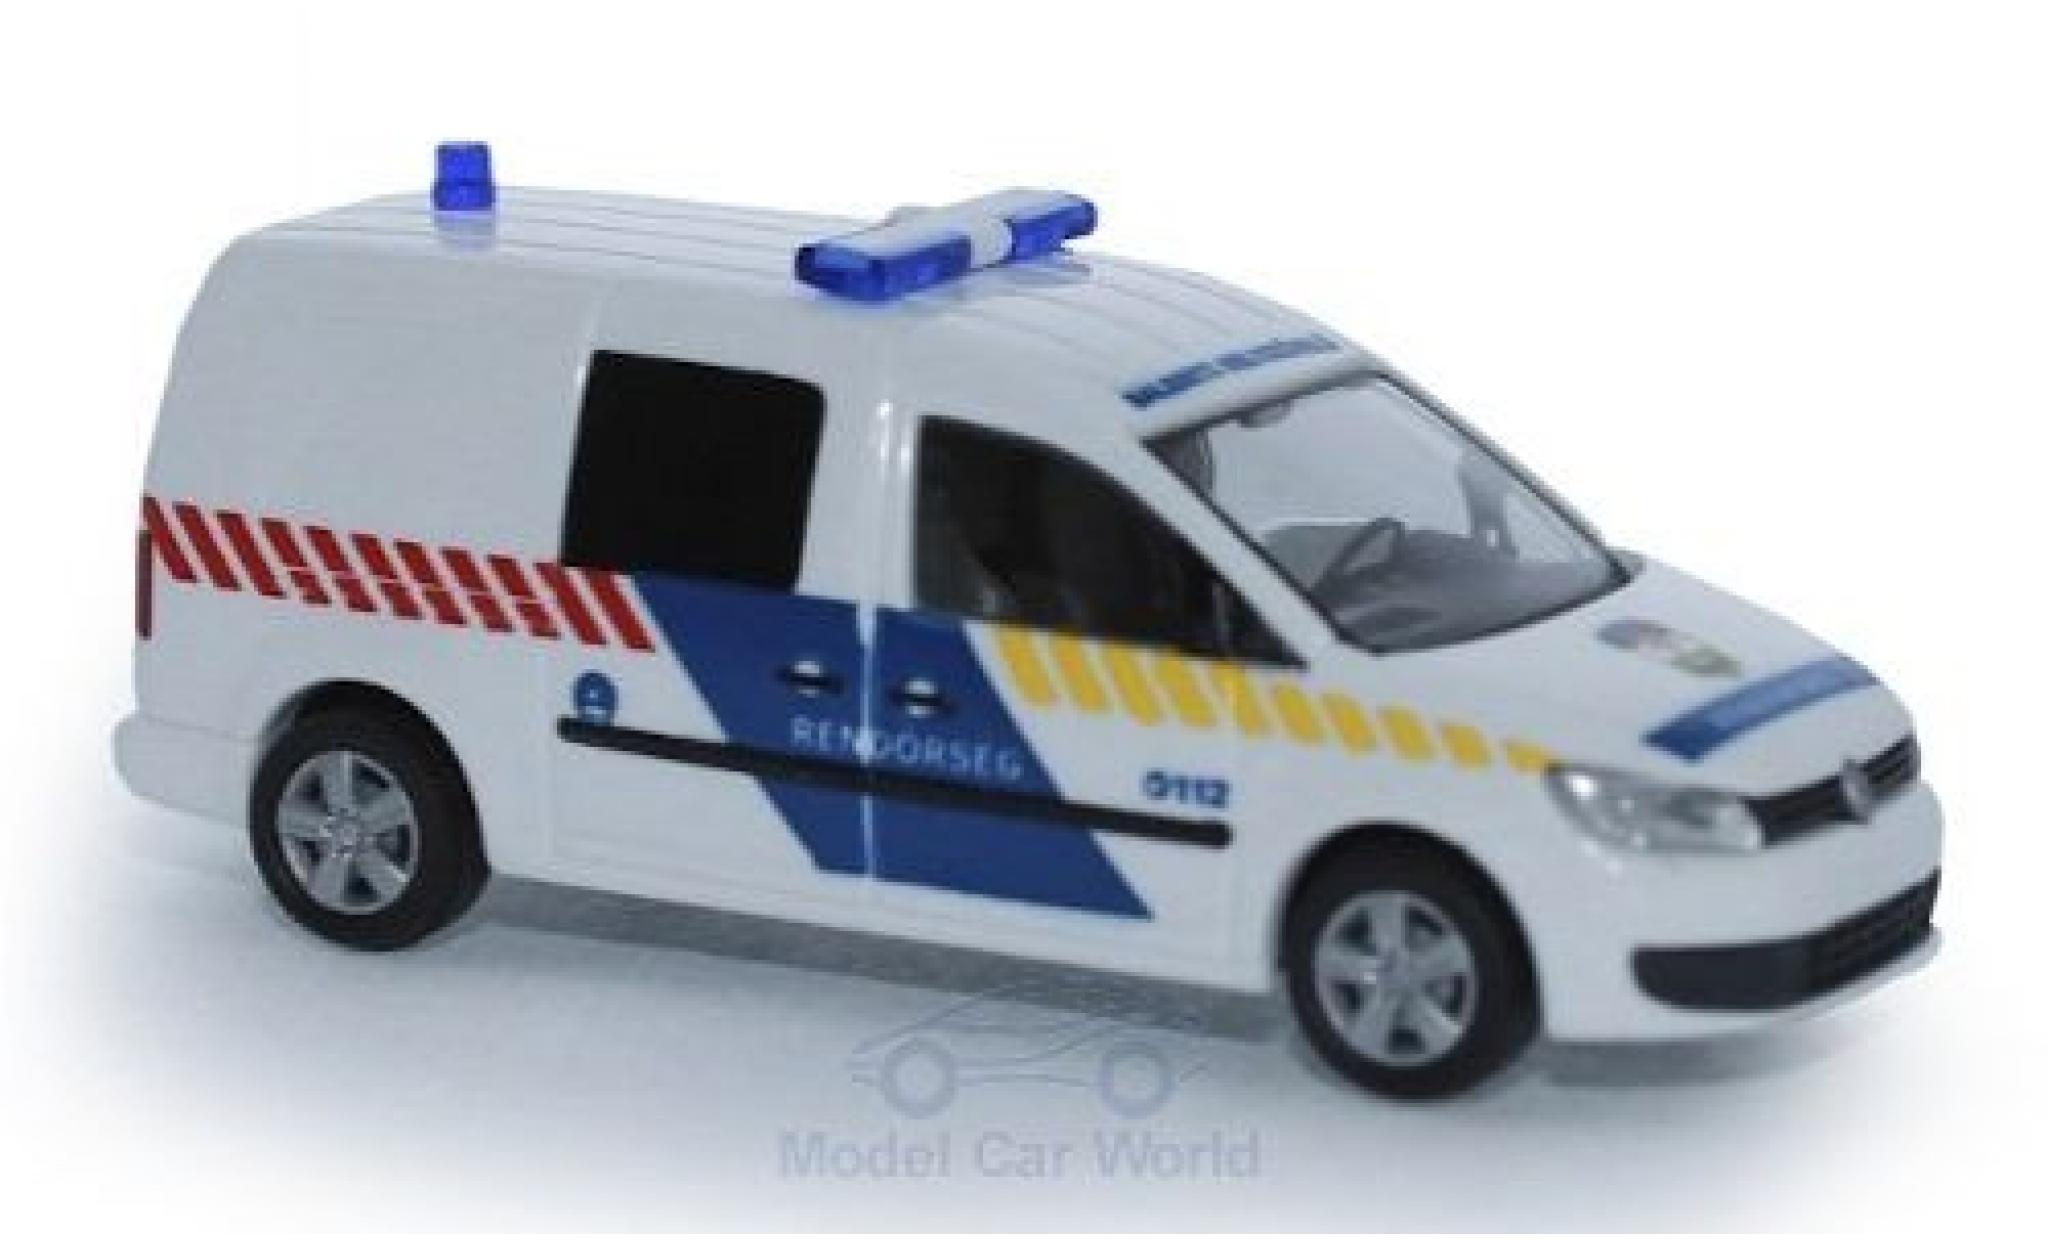 Volkswagen Caddy 1/87 Rietze Maxi Rendörseg 2011